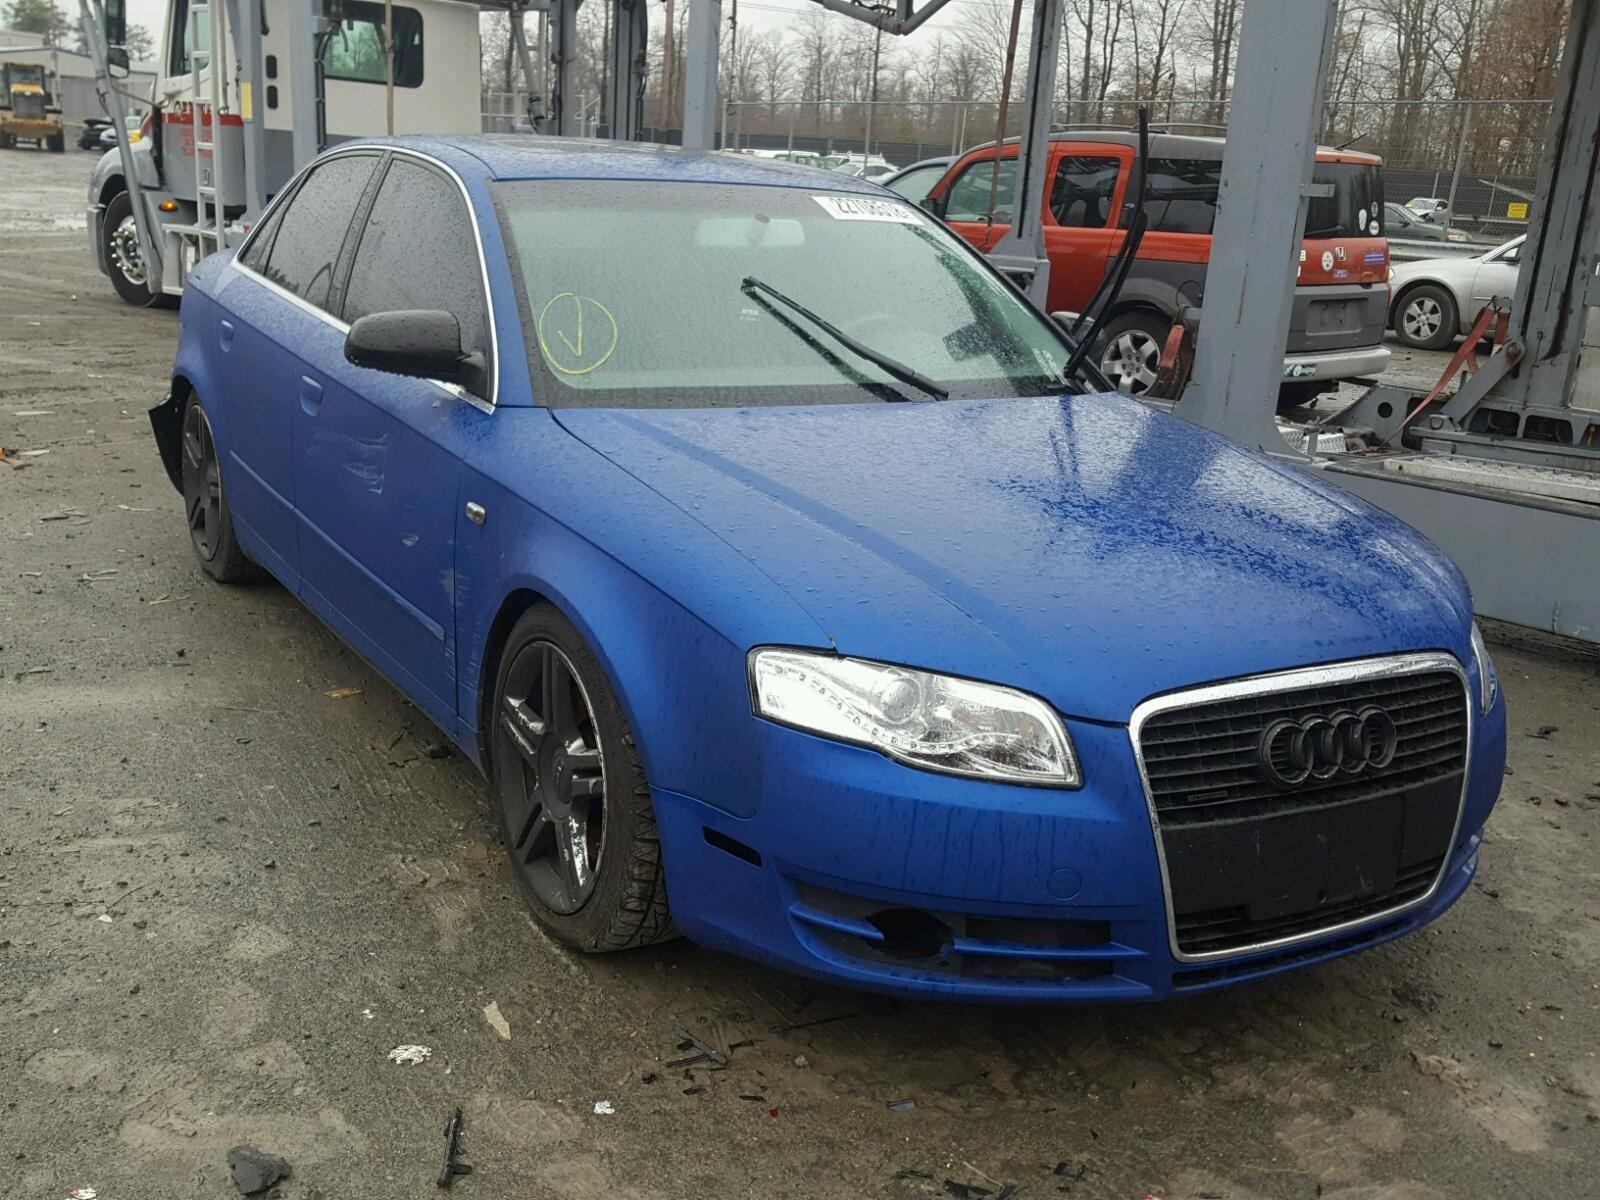 Blue Audi on blue 1980 toyota, blue 1980 fiat, blue 1980 corvette, blue 1980 cadillac, blue 1980 ford, blue 1980 volvo, blue 1980 mustang,